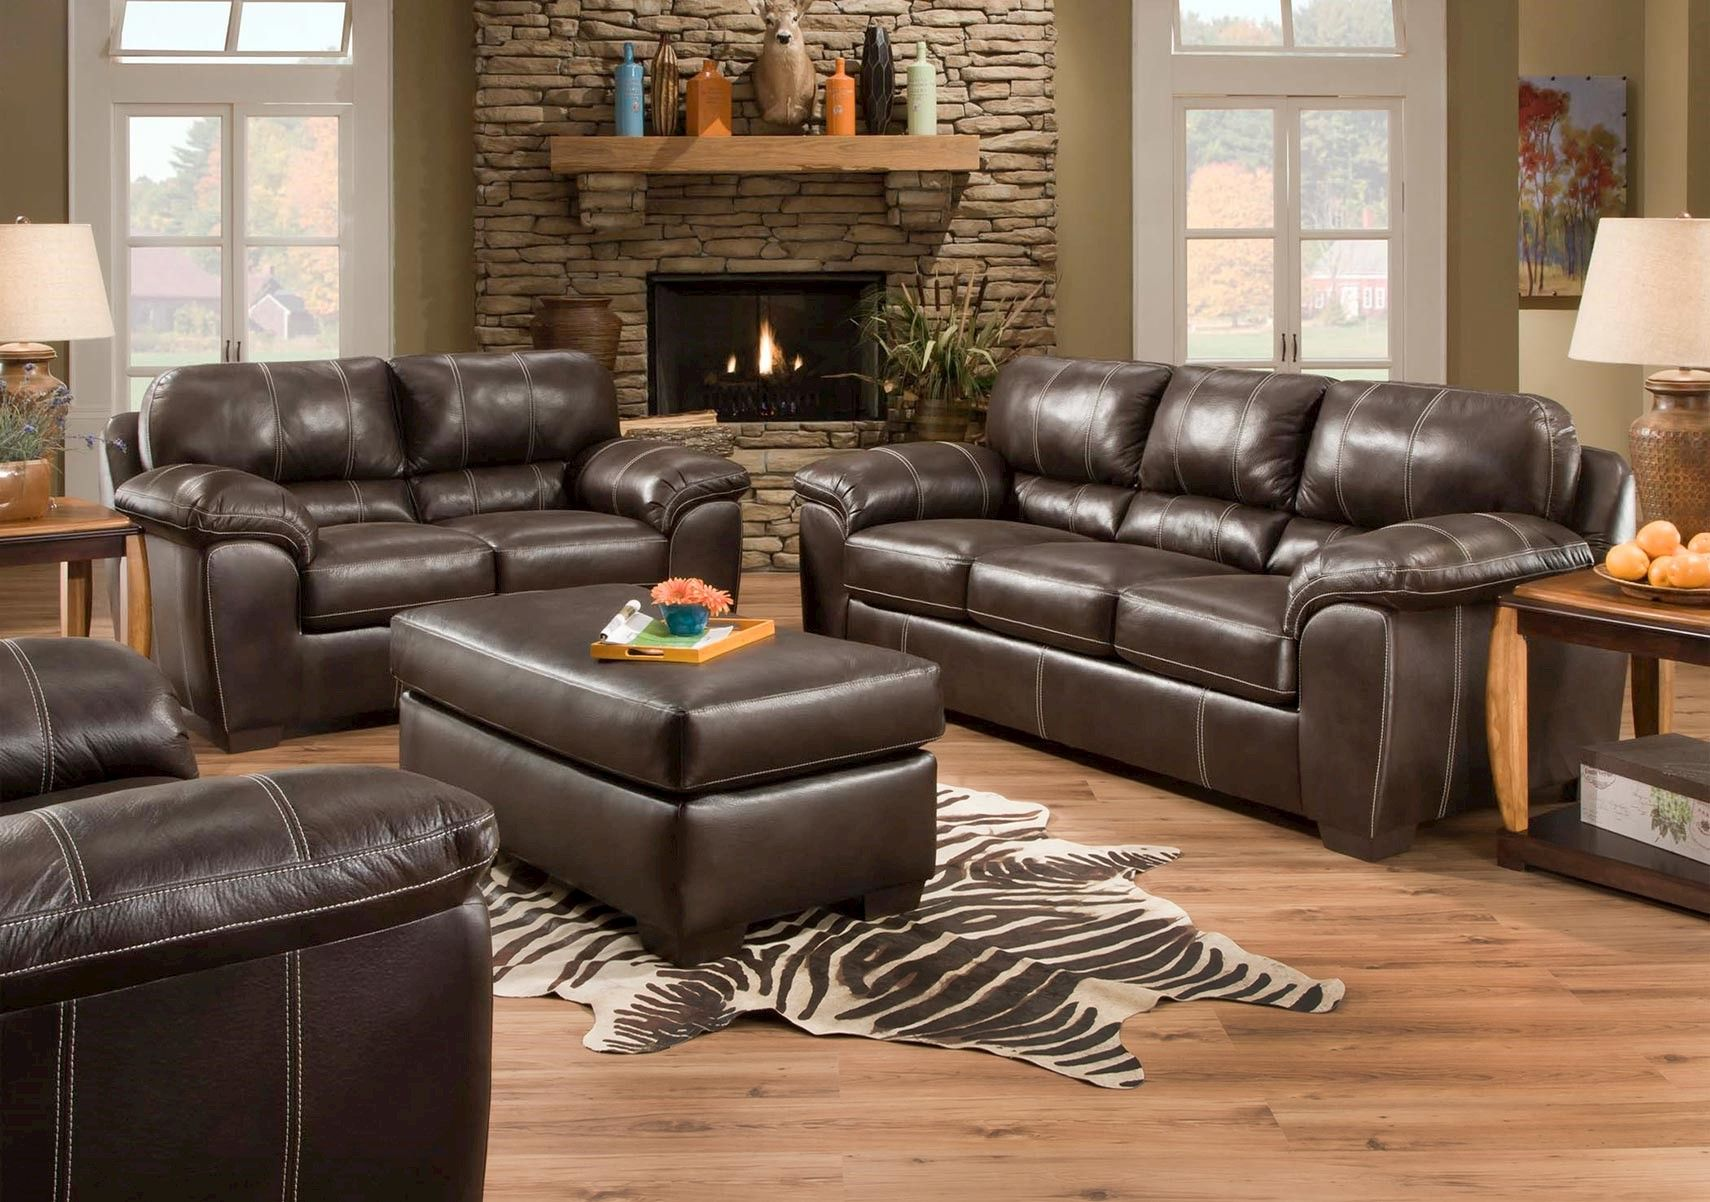 Lacks Black Jack 2 Pc Living Room Set Discount Living